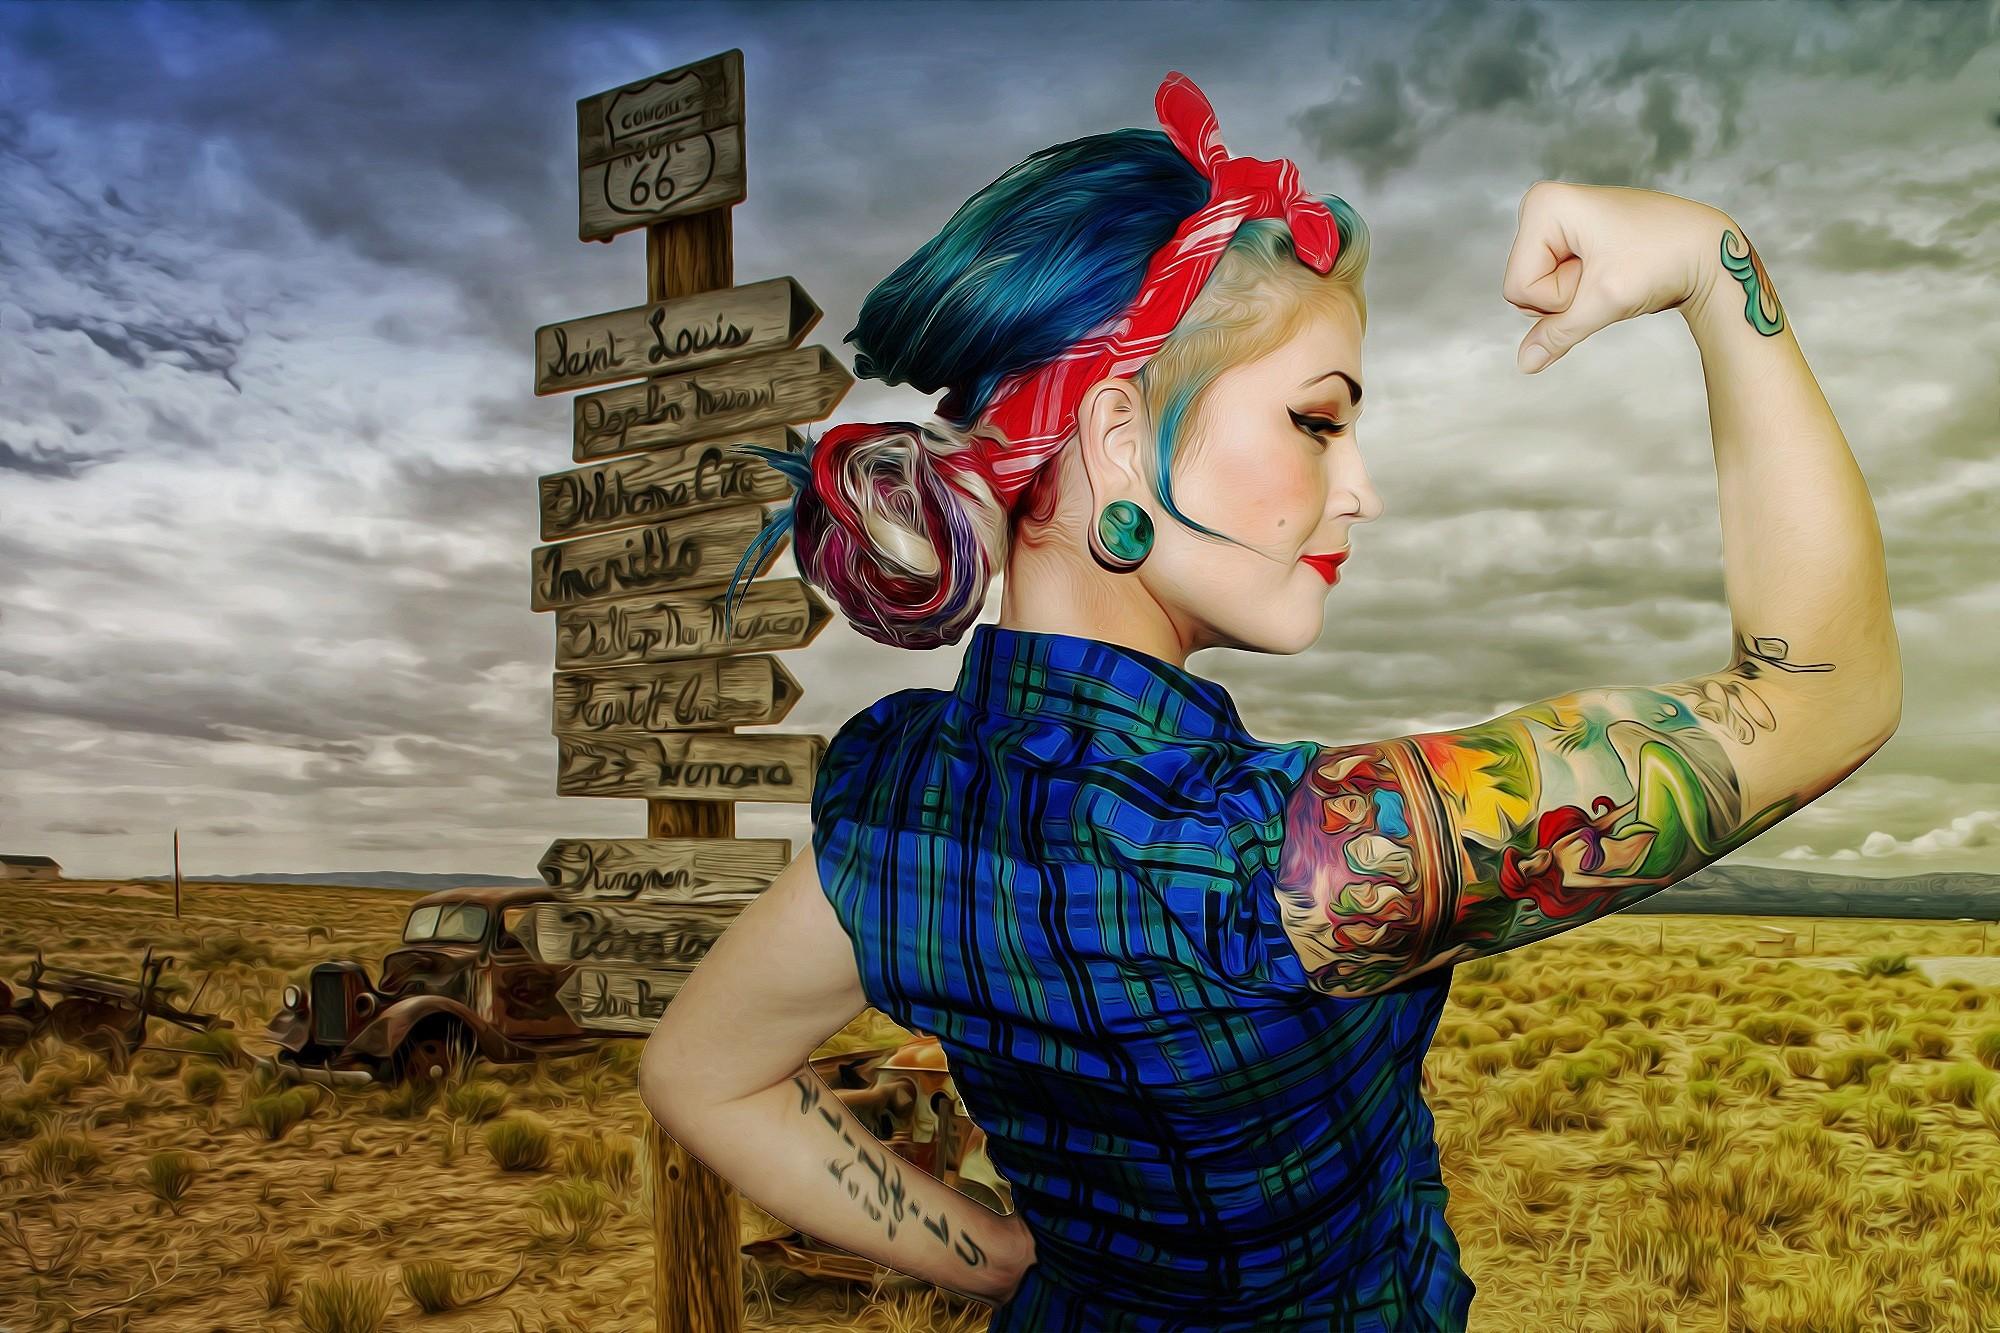 Women – Artistic Woman Pin-Up Tattoo Mood Oil Paint Painting Wallpaper